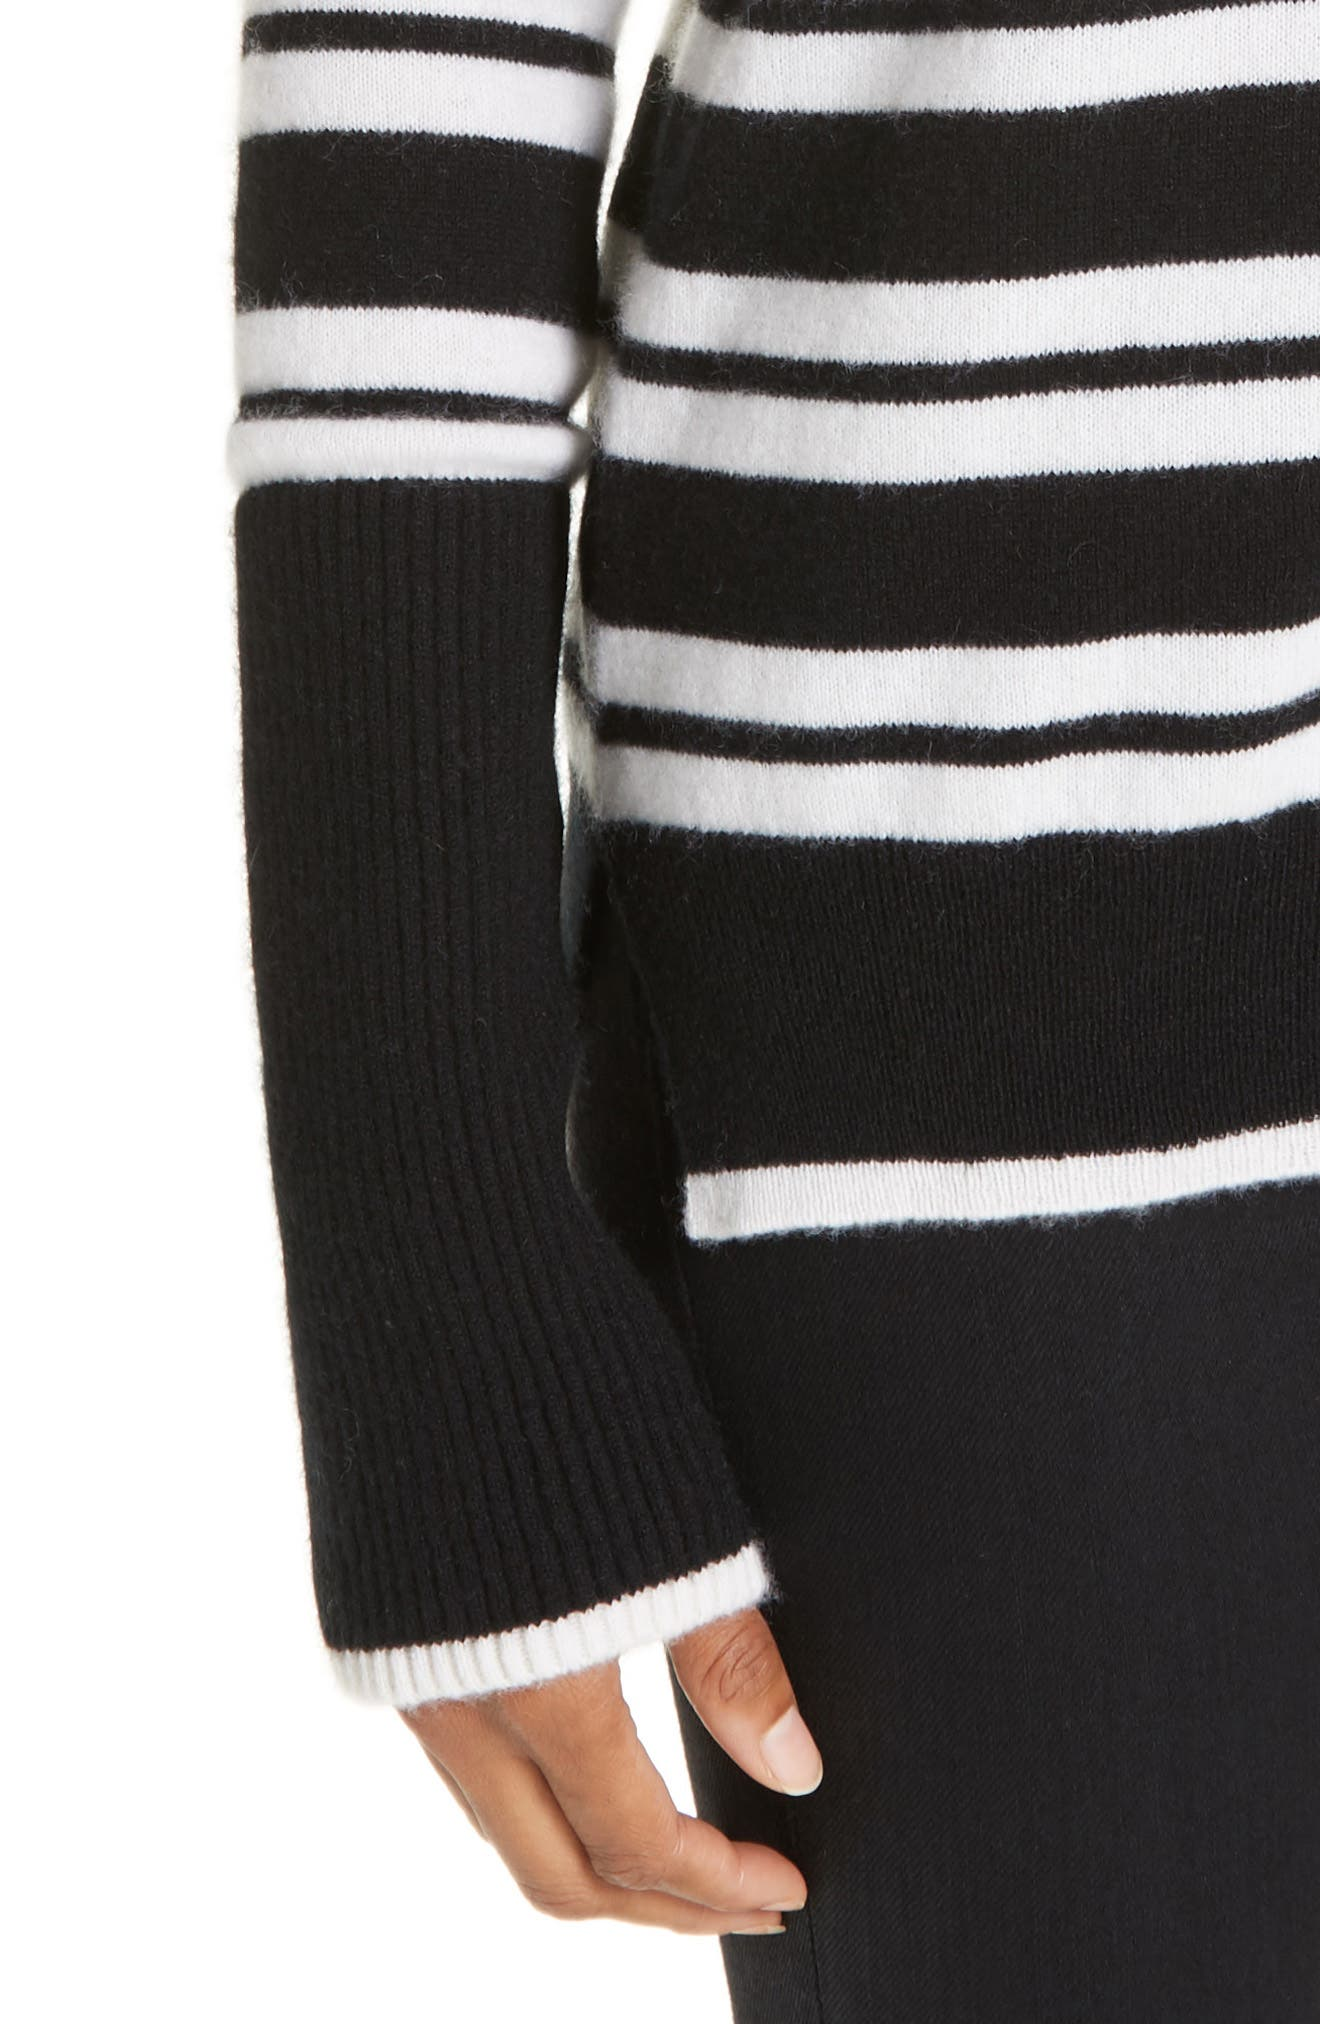 Le Ligne Tripe Stripe Cashmere Sweater,                             Alternate thumbnail 4, color,                             BLACK/ CREAM